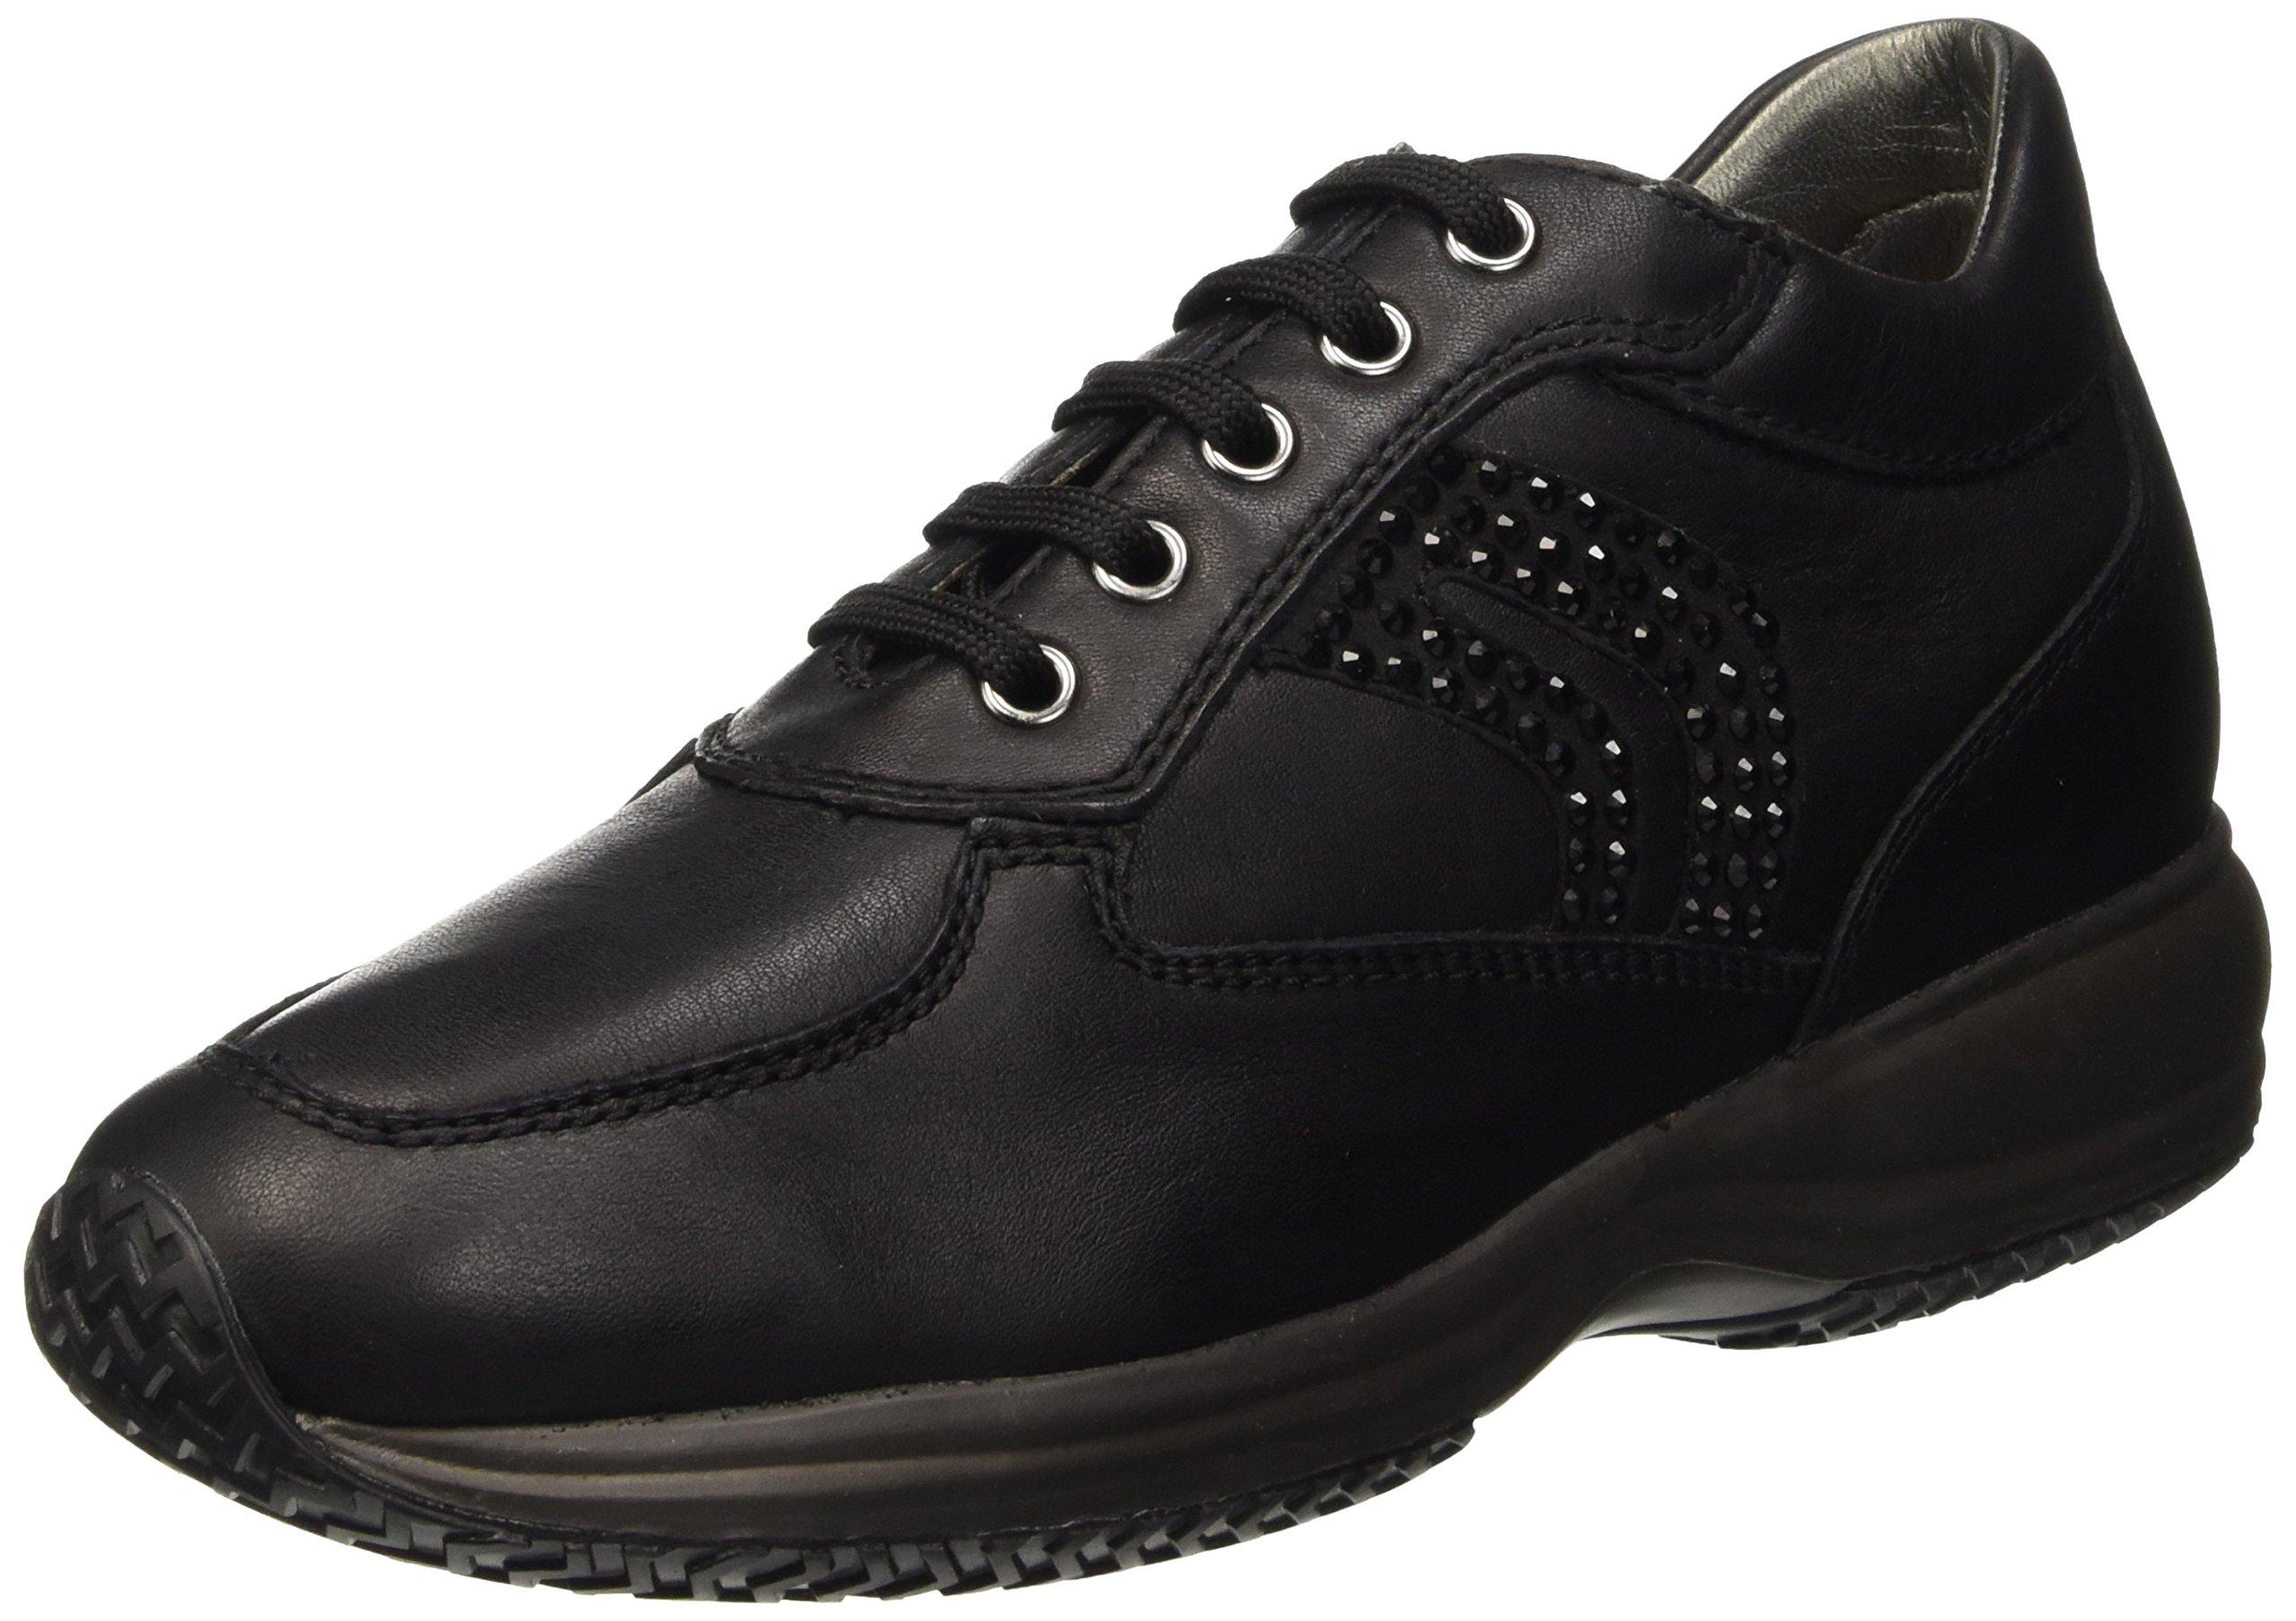 Hautes Happy CSneakers FemmeNoirblack Geox C999939 D Eu 7gf6ybIYv